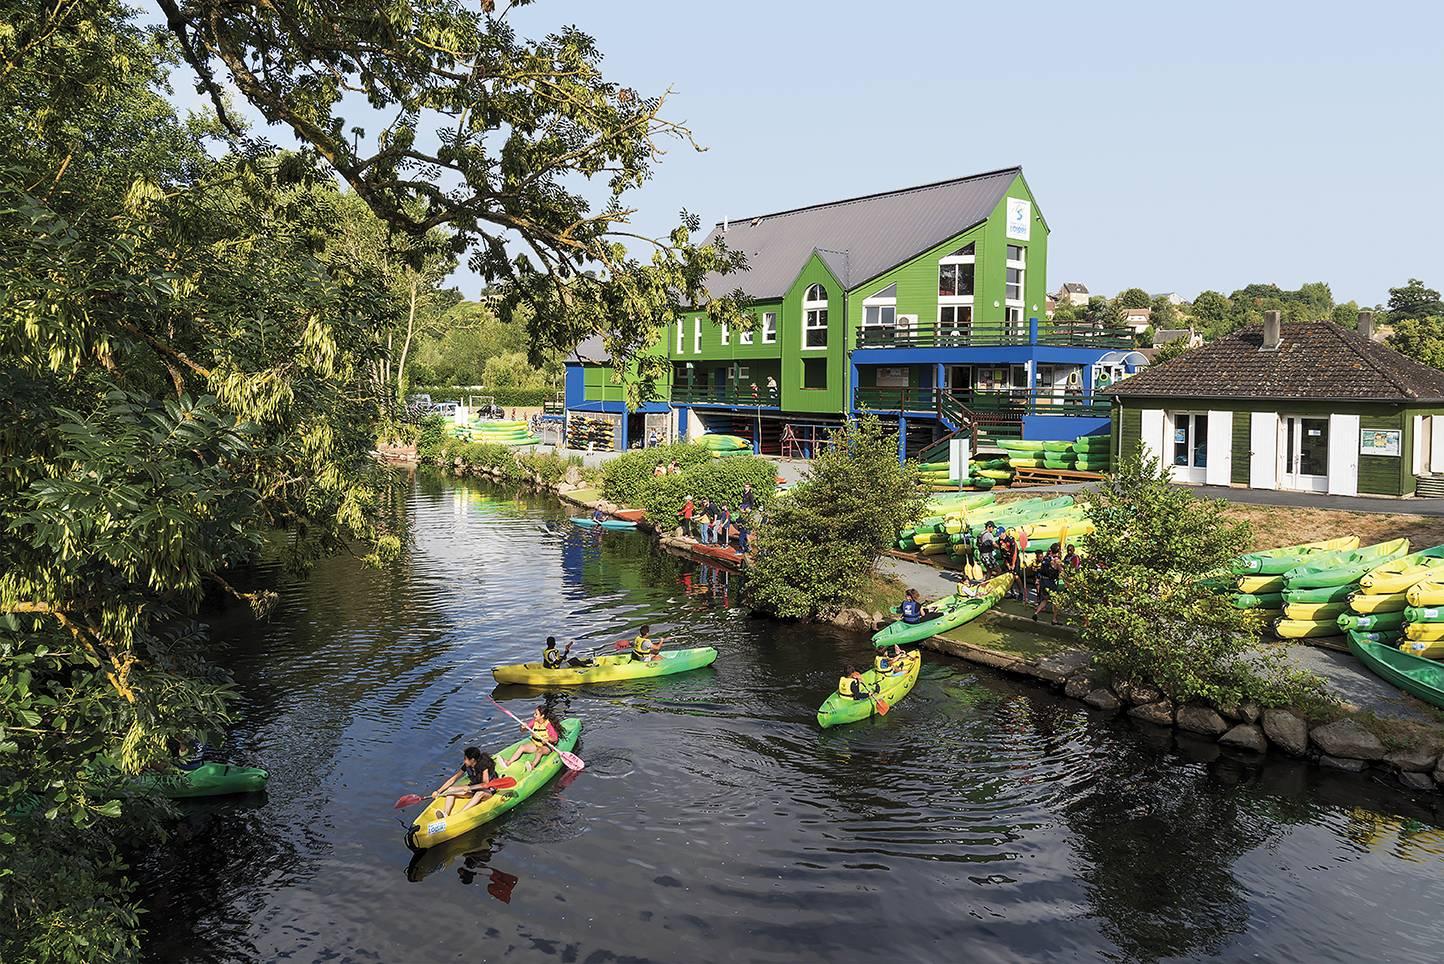 Location Canoë, kayak, paddle - Pont-d'Ouilly Loisirs